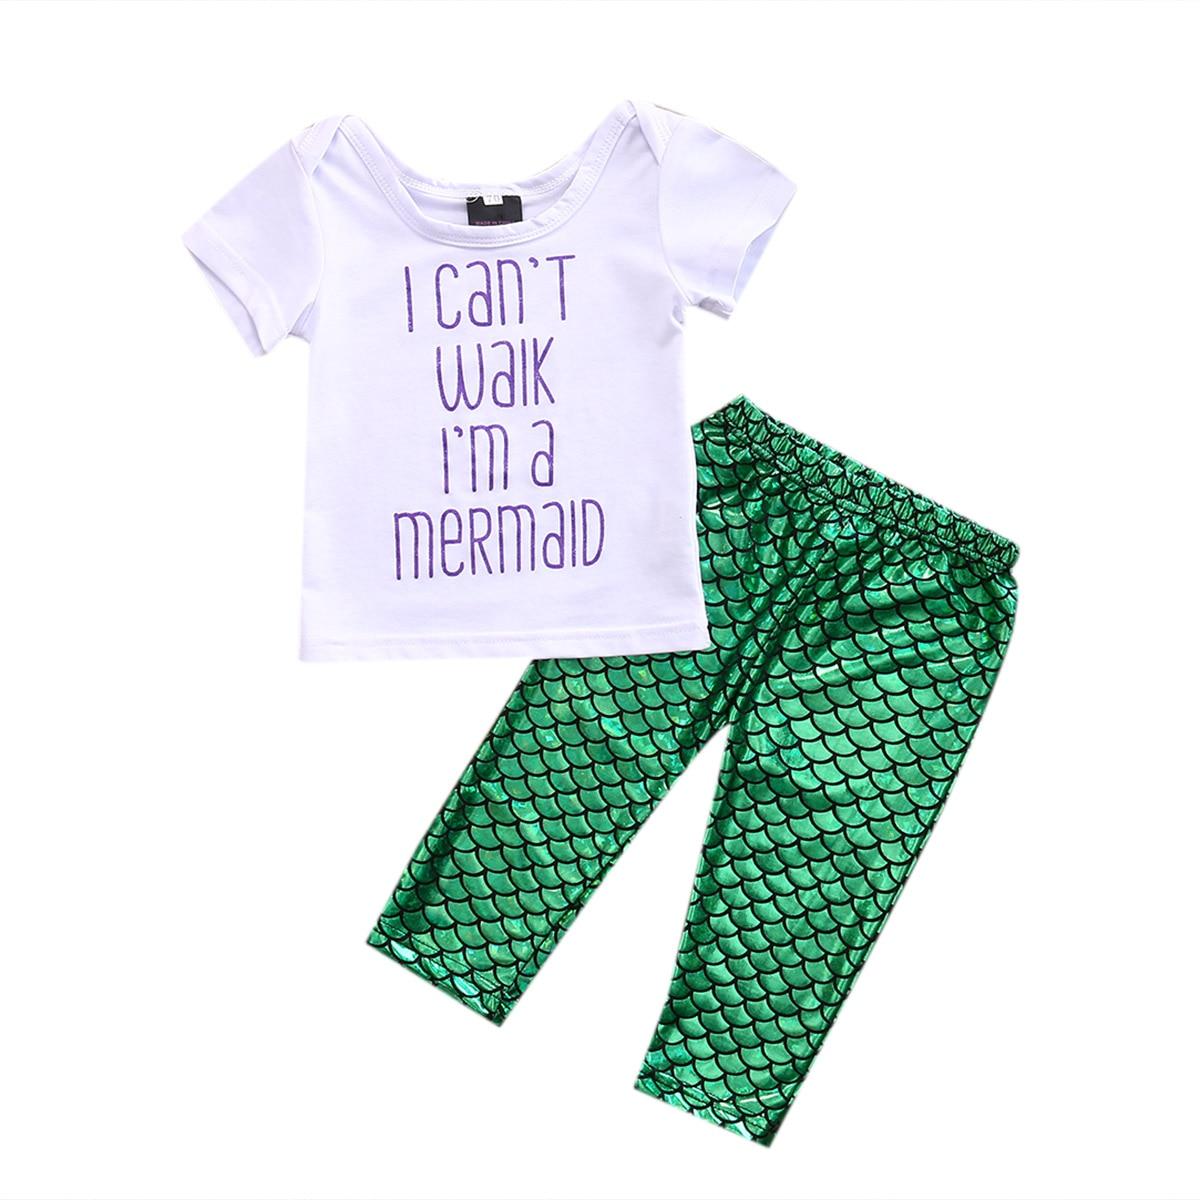 3PCS Set Newborn Baby Girls Mermaid Clothes 2017 Summer Short Sleeve Letter Printed T-shirt+Green Mermaid Pant Legging Outfits disney baby baby girls newborn 2 piece legging set